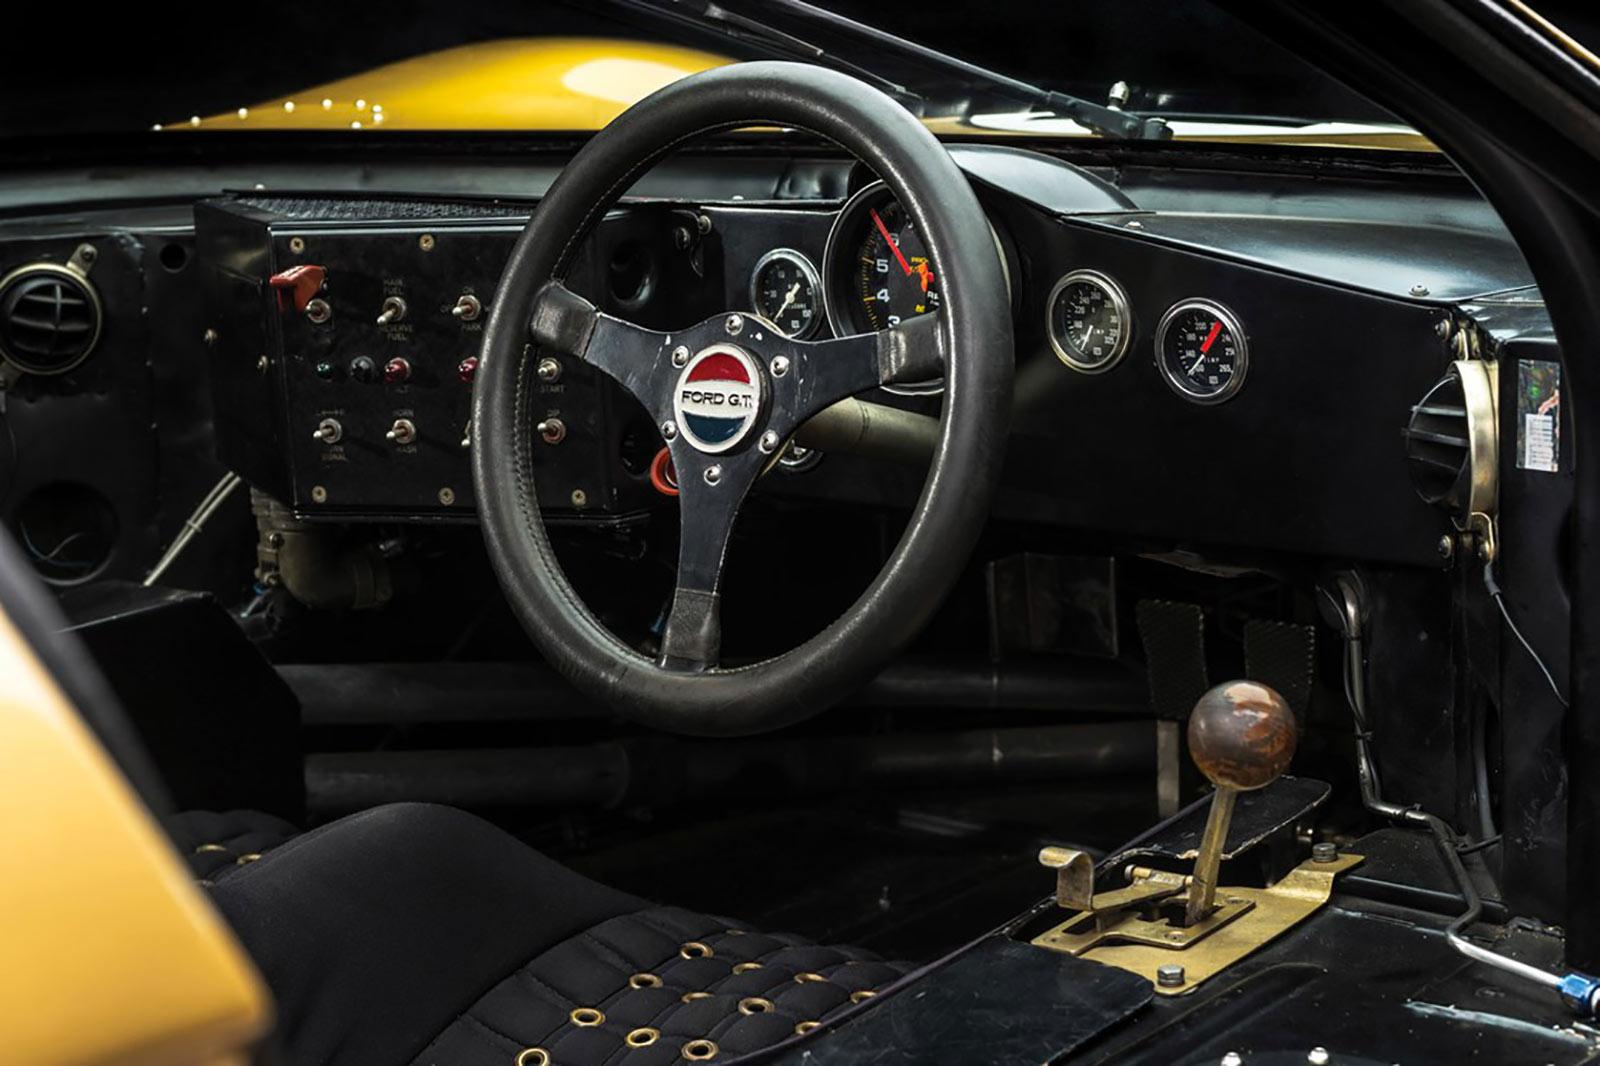 Ford GT 40 MK 2 Le Mans 1966